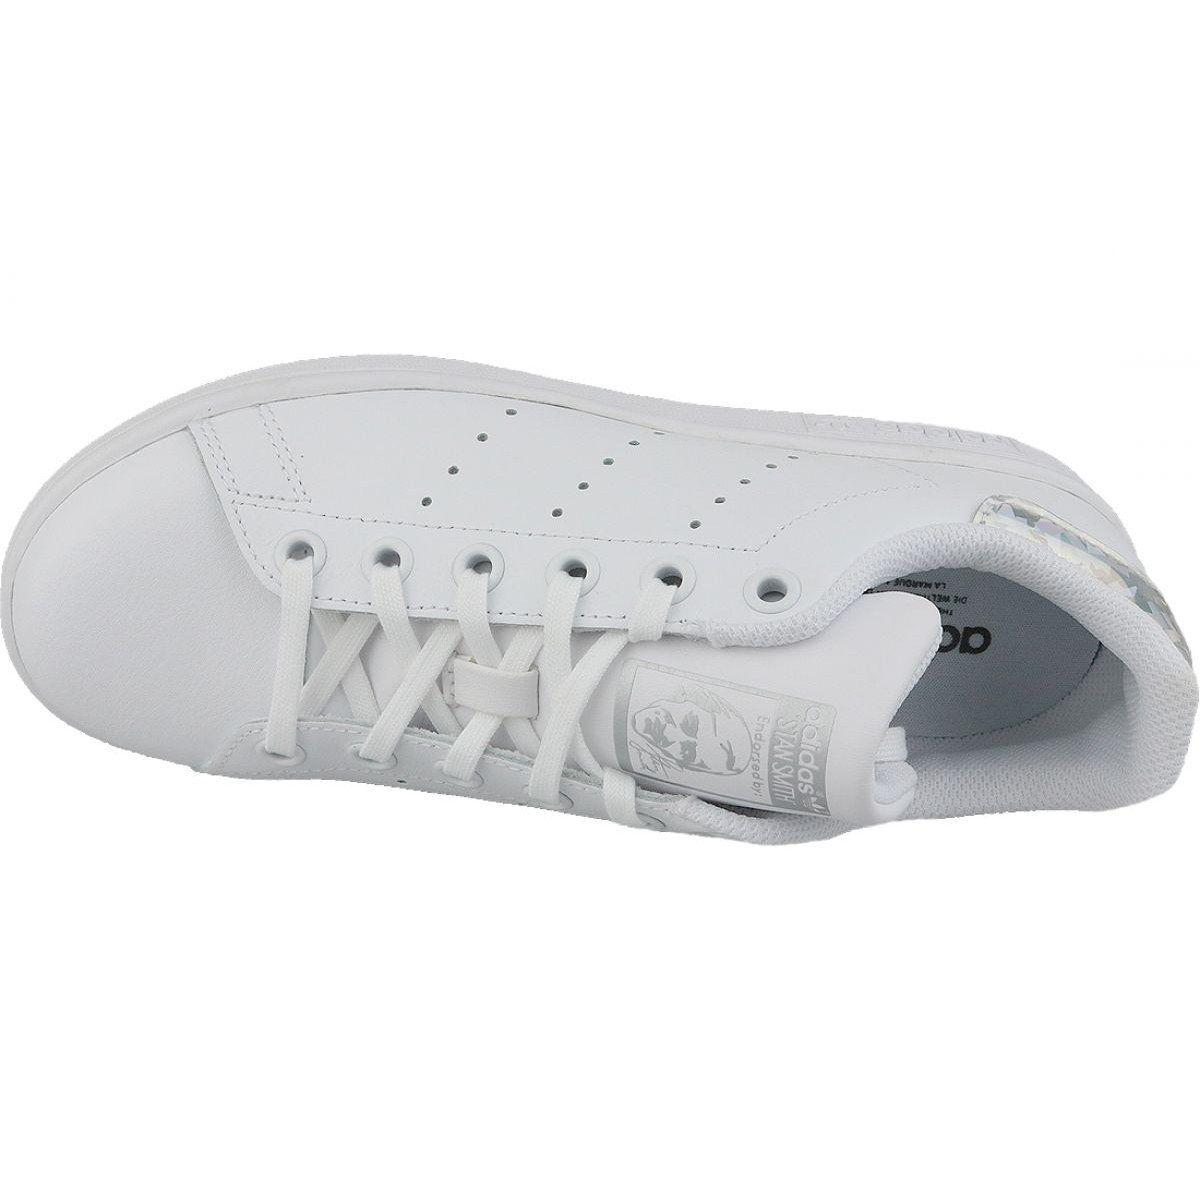 Buty Adidas Stan Smith Jr Ee8483 Biale Adidas Stan Smith Sports Shoes Adidas Adidas